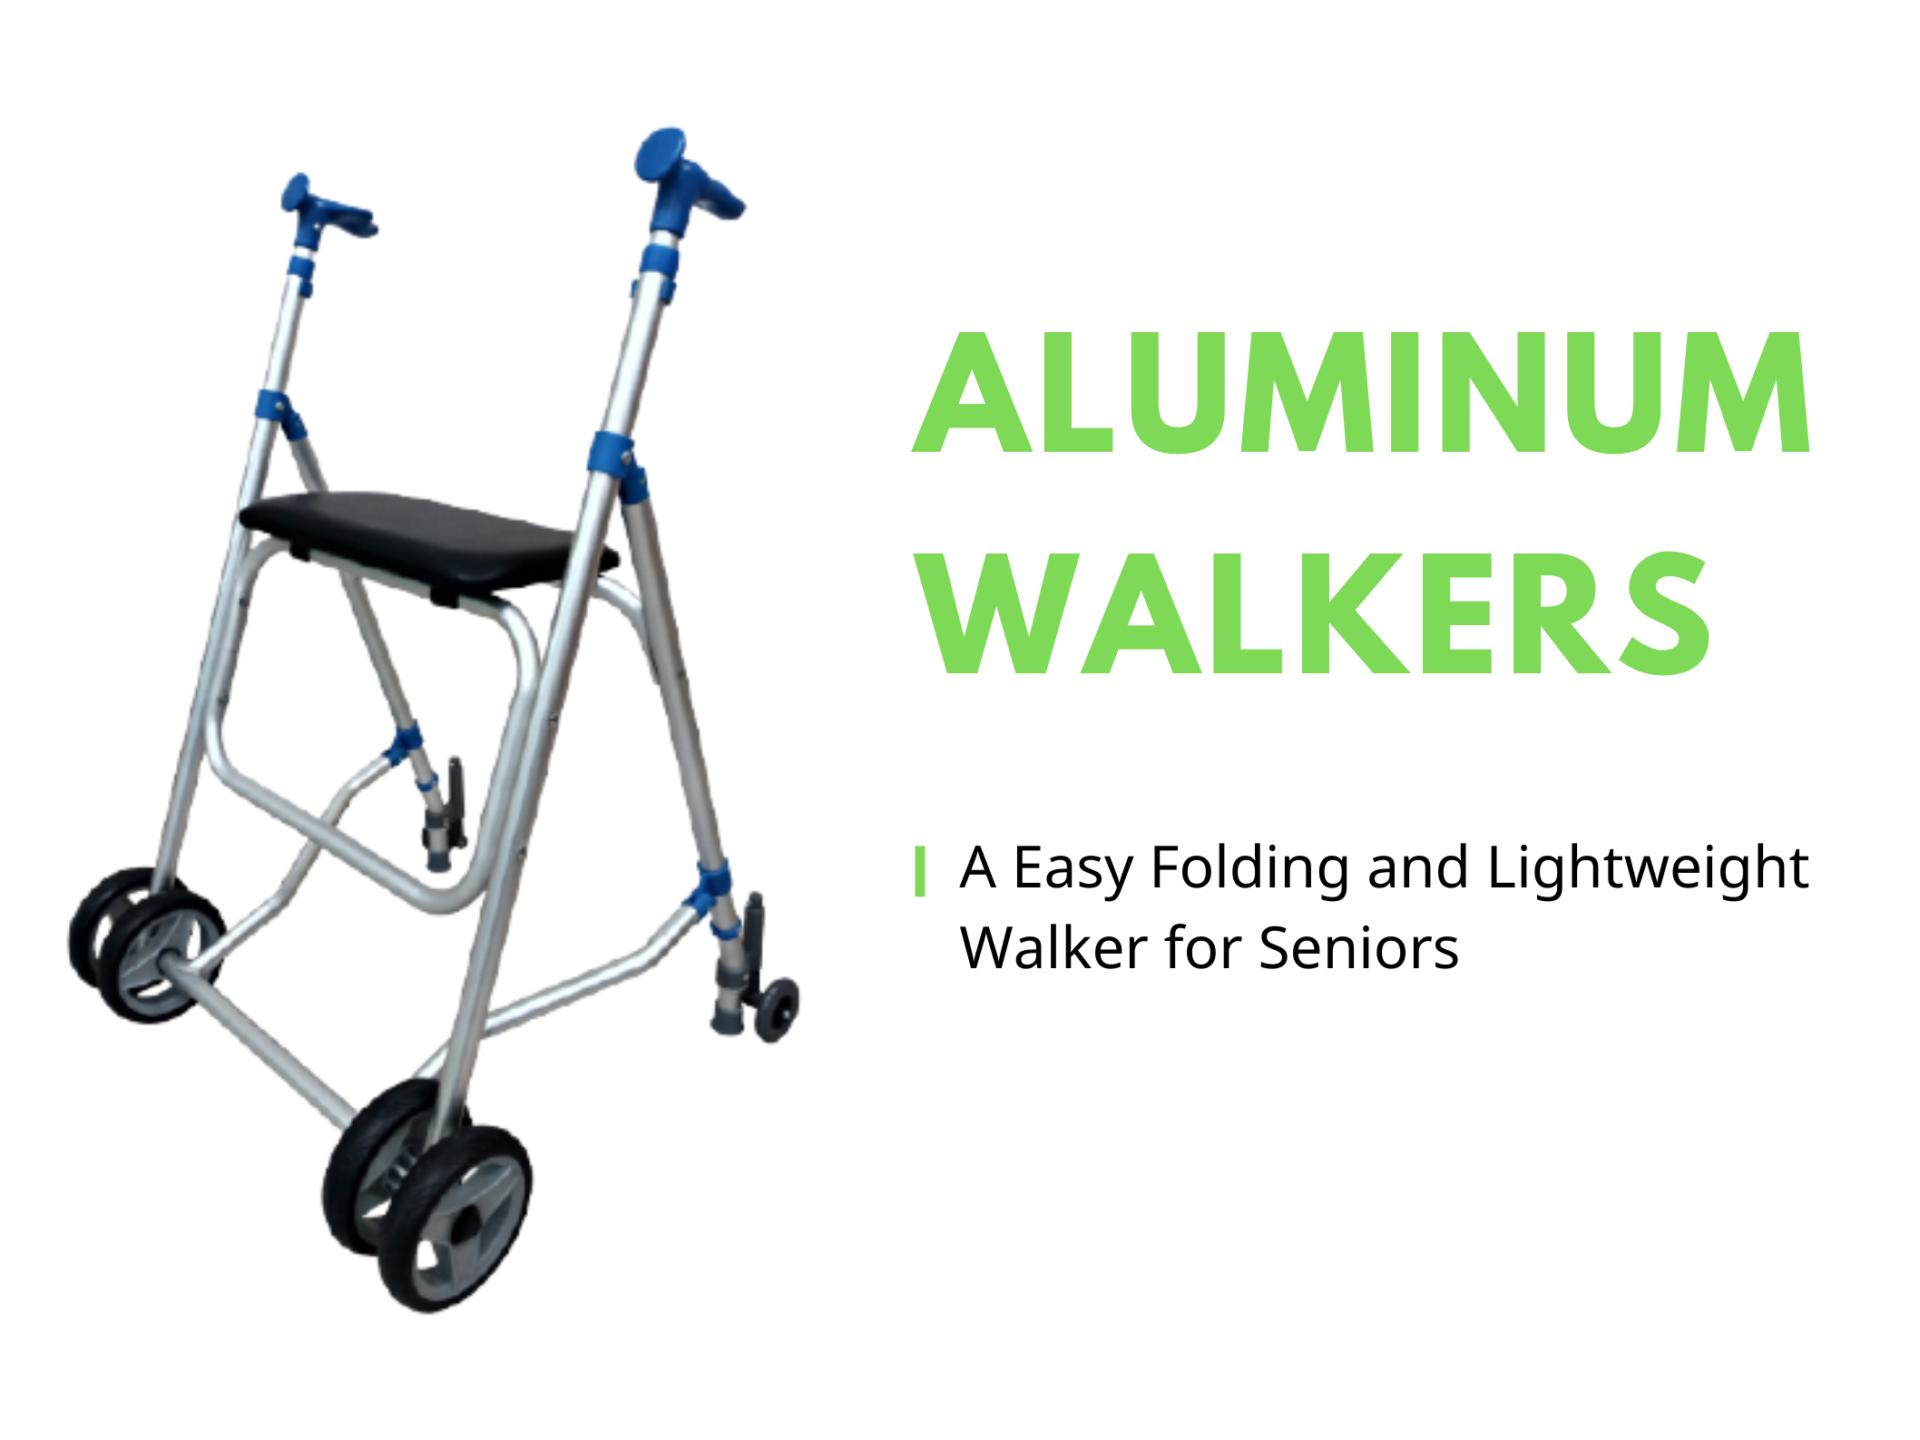 Aluminum Walkers